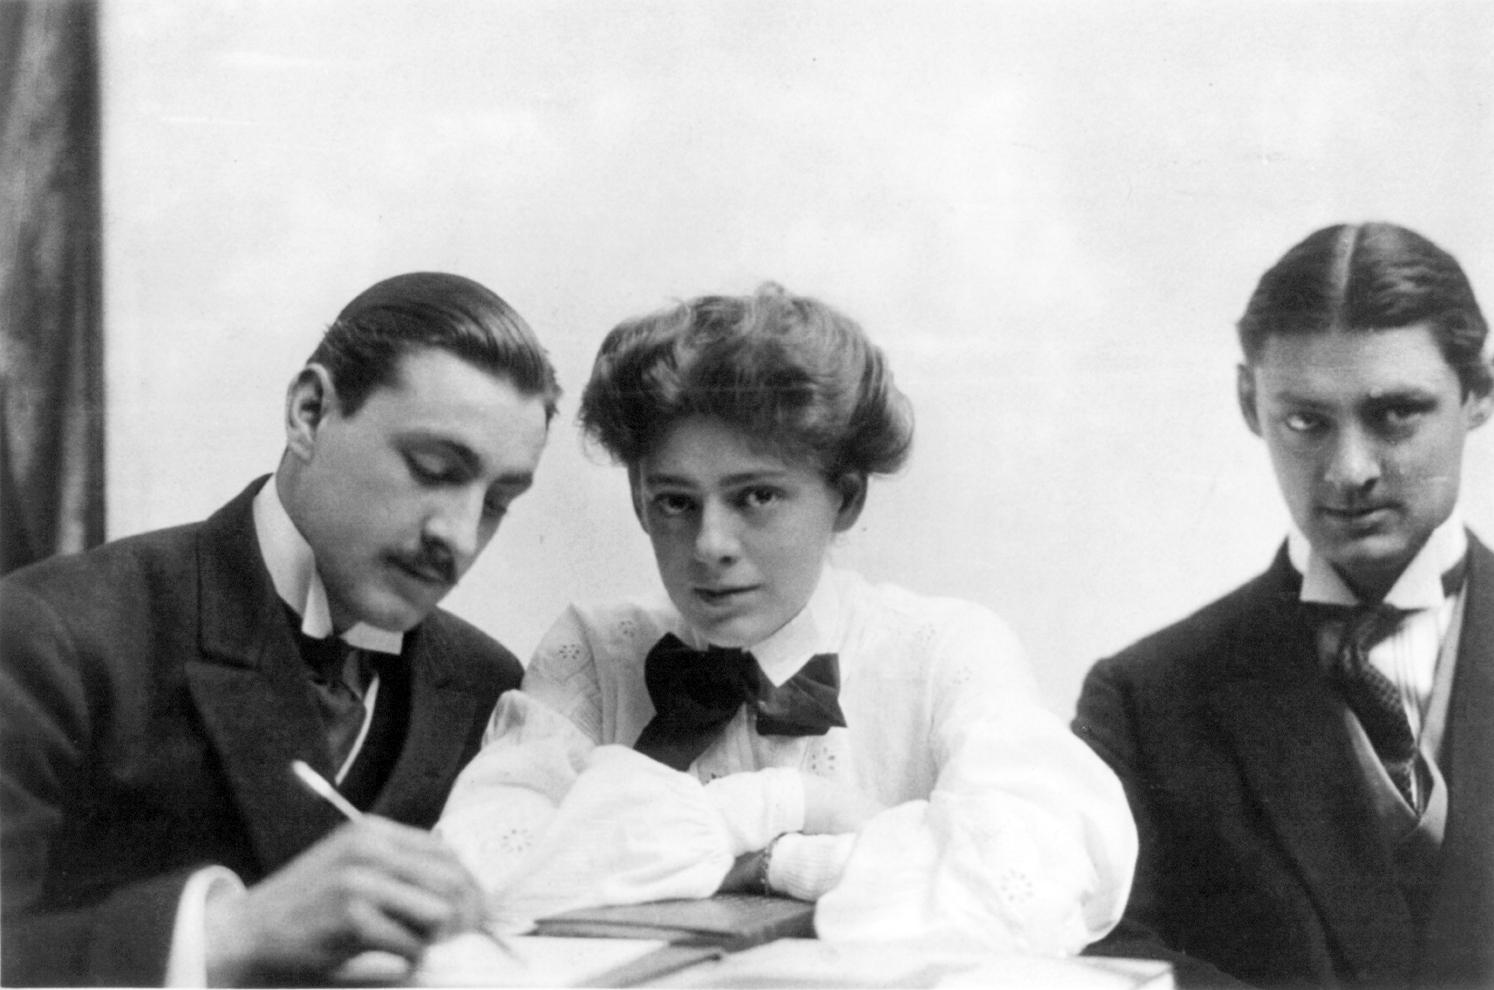 Lionel,_Ethel,_and_John_Barrymore_cph.3b